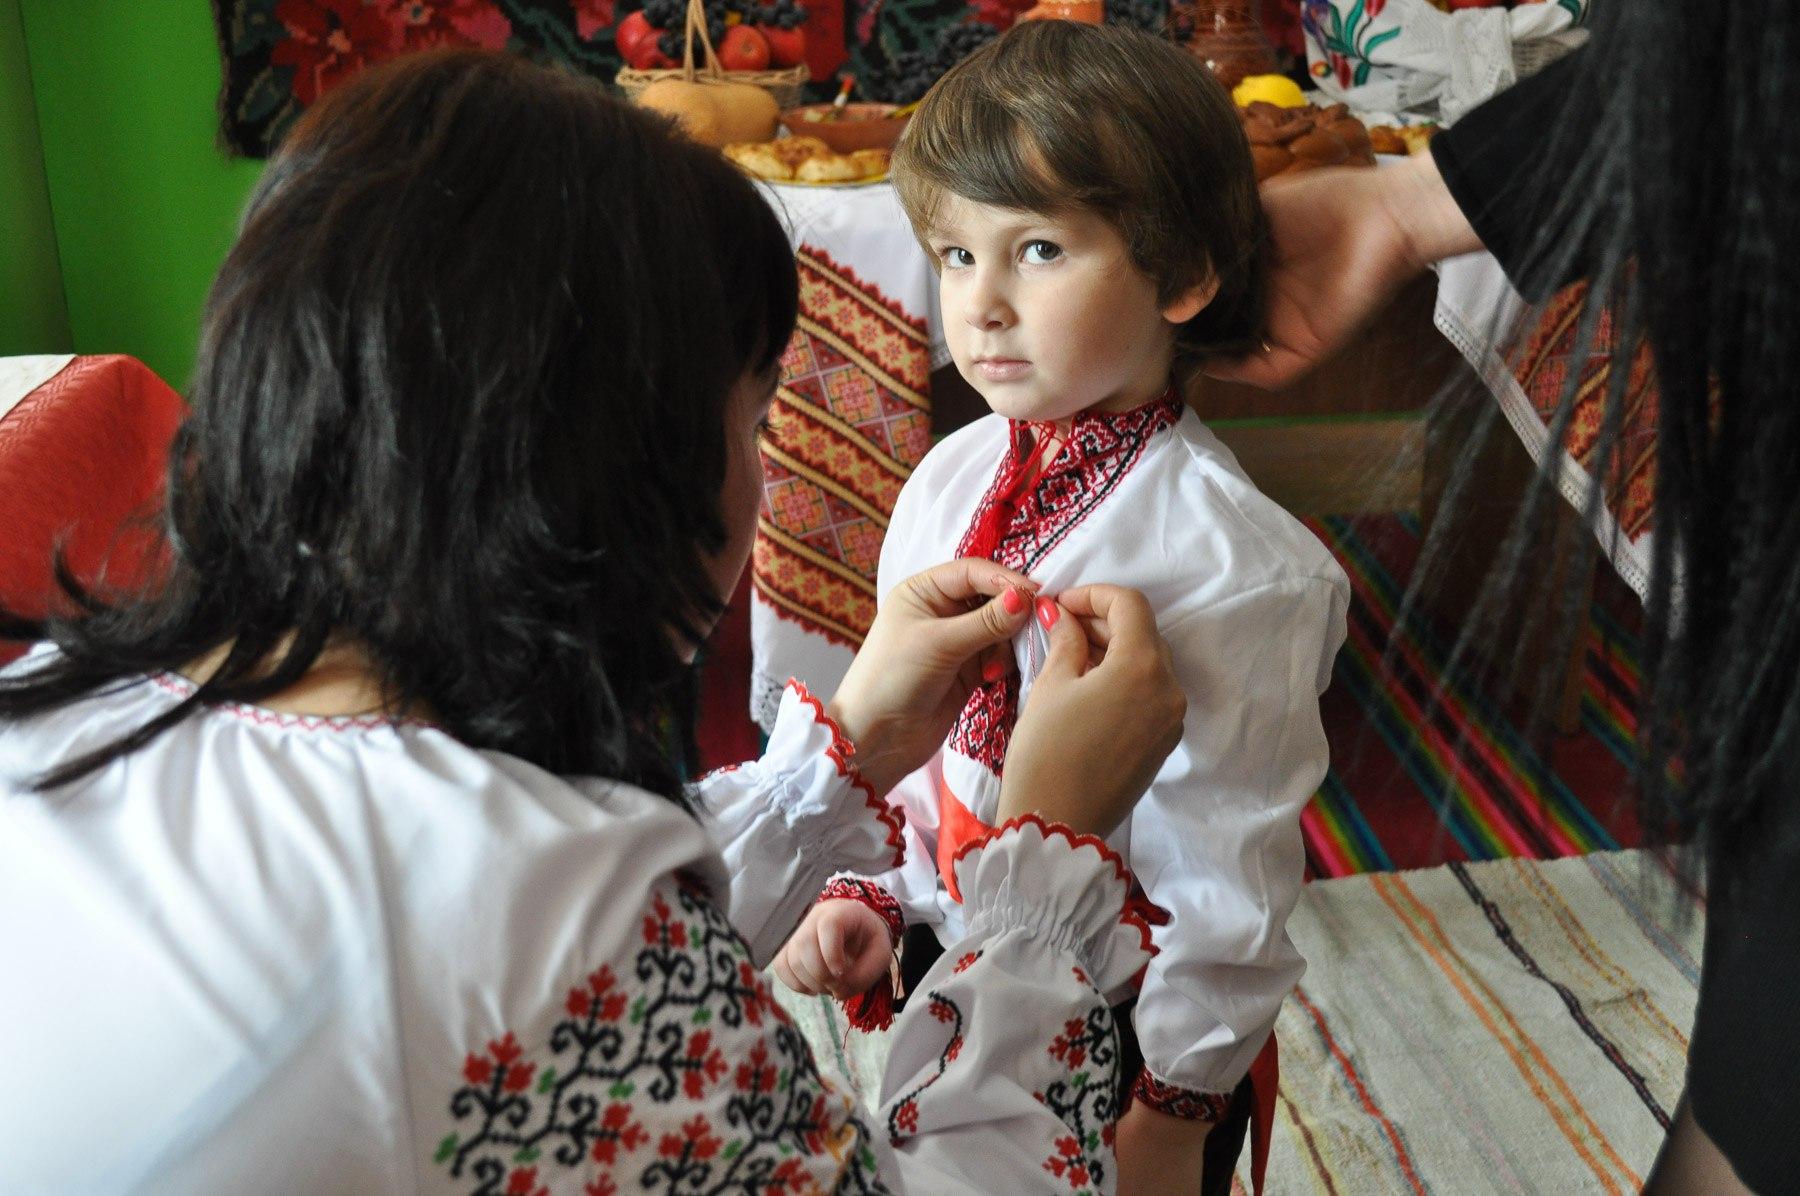 молдавский праздник мэрцишор фото настроек